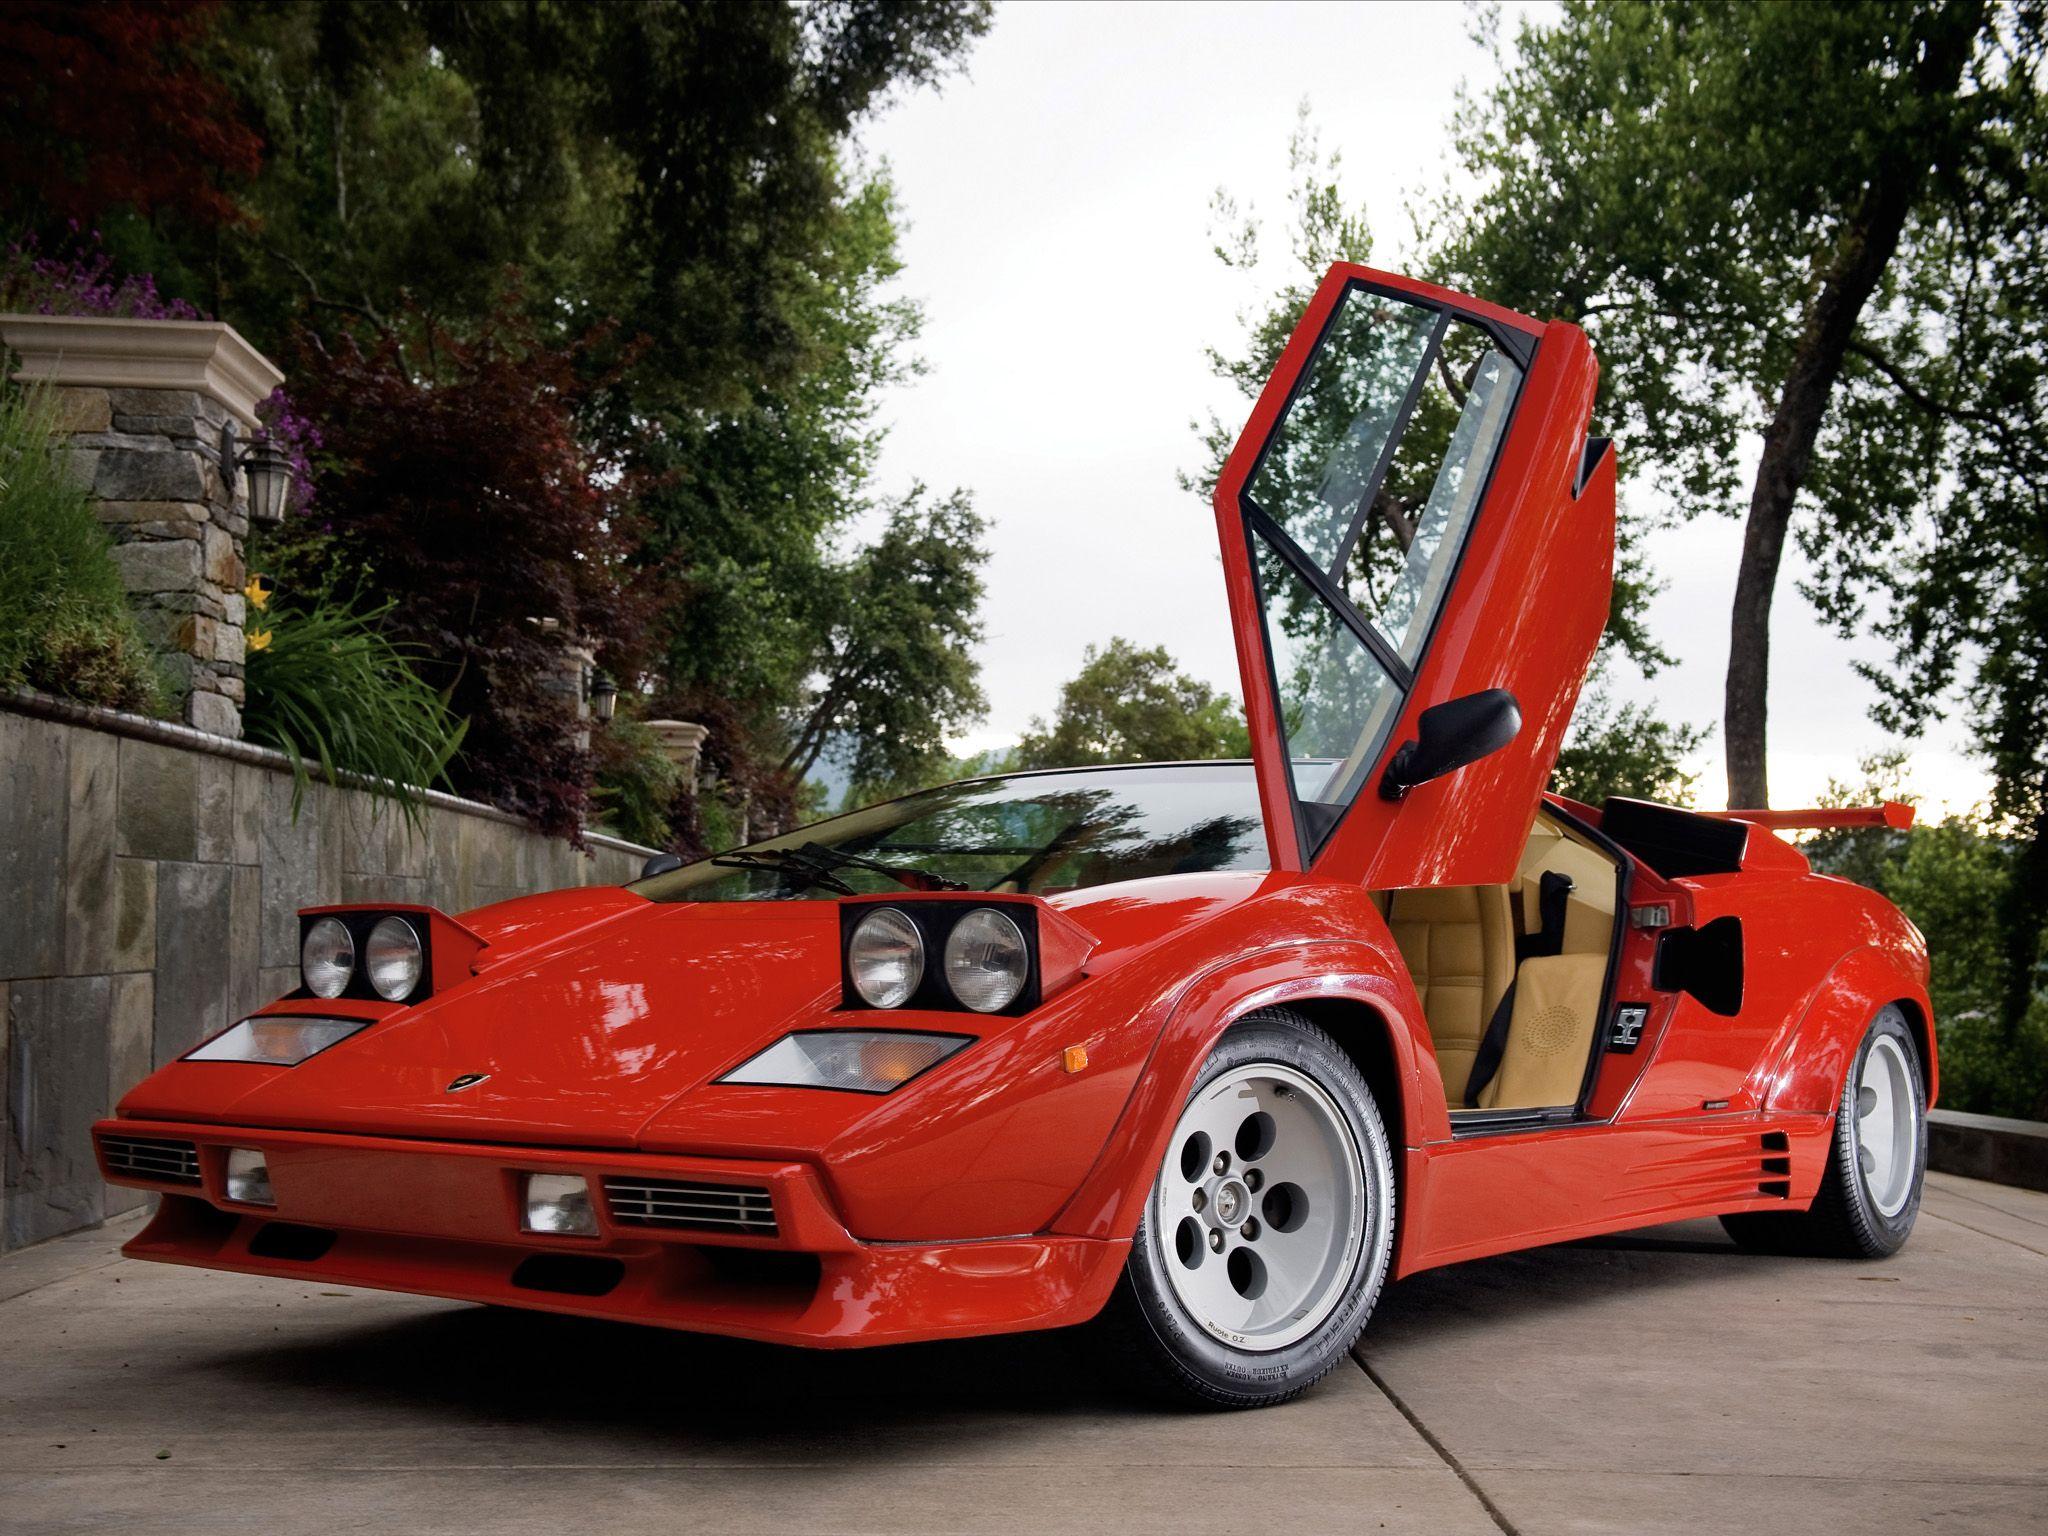 1986 Lamborghini Countach 5000 QV -   Exotics   Pinterest ... on lamborghini jalpa, ferrari testarossa wallpaper, gumpert apollo wallpaper, lamborghini huracan, lamborghini lm002, enzo ferrari wallpaper, mclaren f1 wallpaper, ferrari f430 wallpaper, porsche 959 wallpaper, lamborghini limo, dodge viper wallpaper, lamborghini reventon, lamborghini diablo, austin healey 3000 wallpaper, lamborghini murcielago, porsche 911 wallpaper, lamborghini embolado, lamborghini veneno, lamborghini gallardo wallpaper, vw rabbit gti wallpaper,